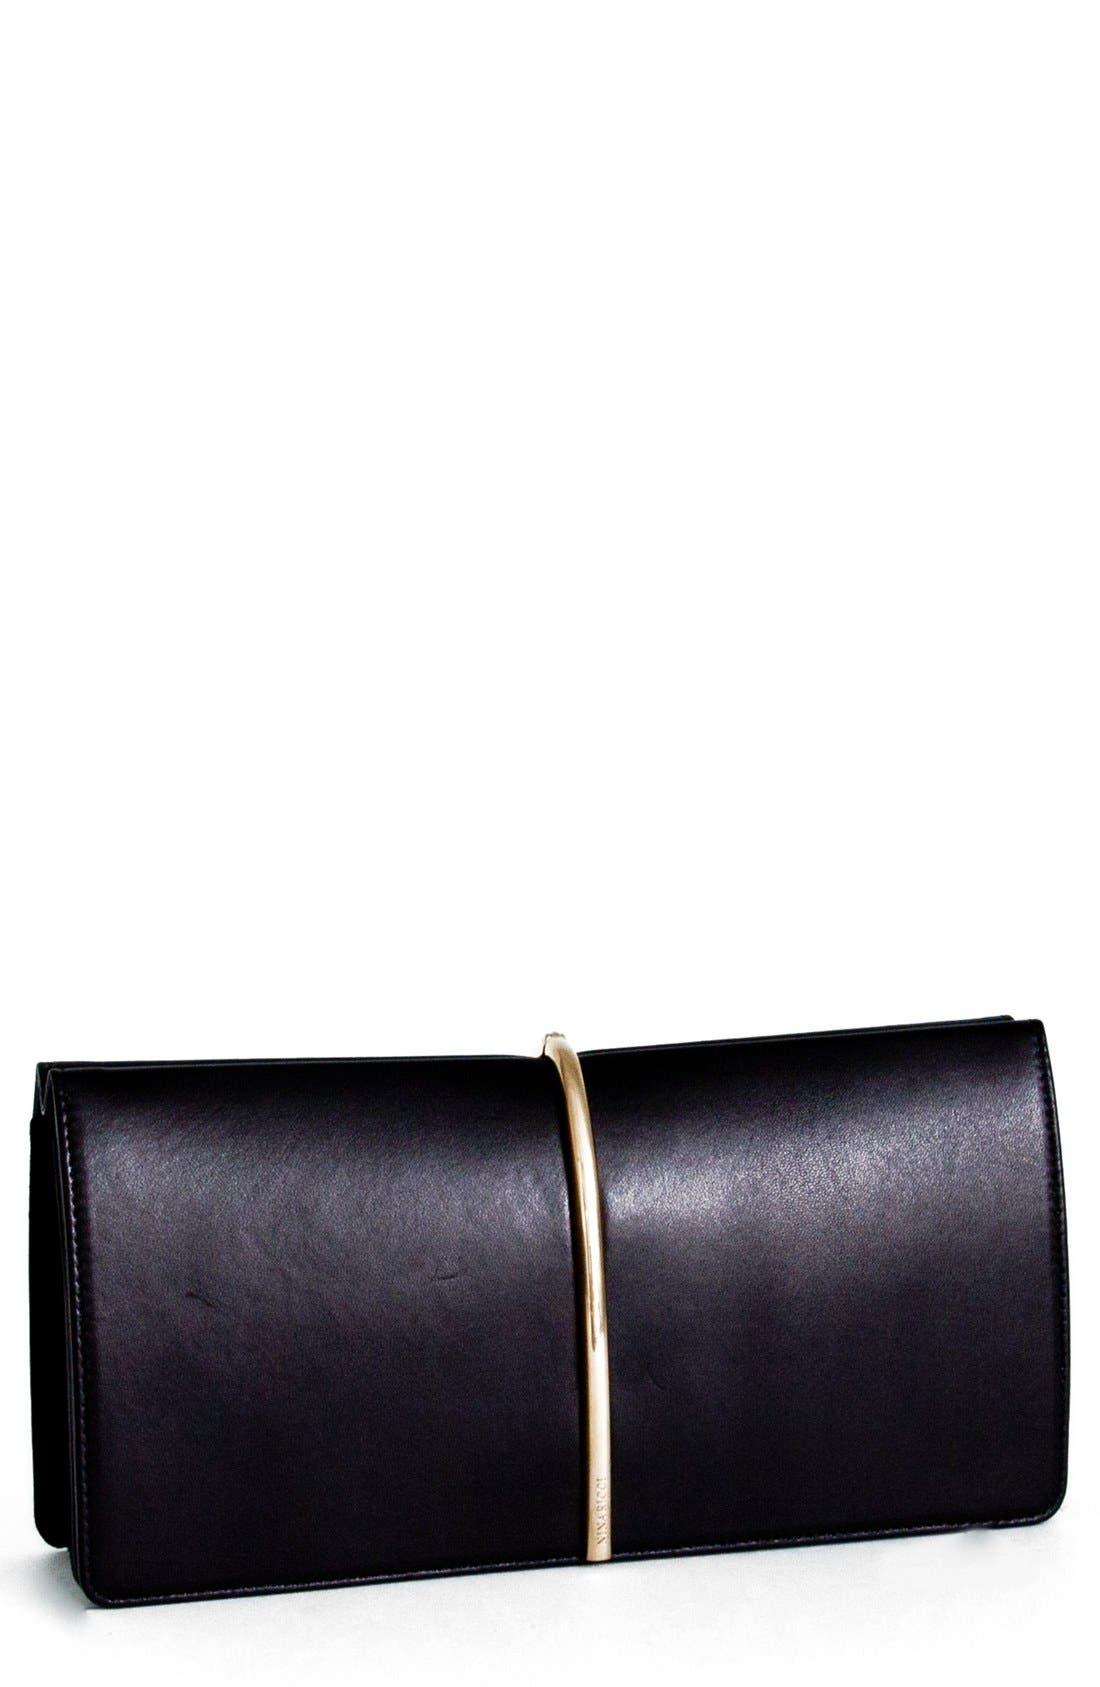 Alternate Image 1 Selected - Nina Ricci 'Arc' Leather Clutch